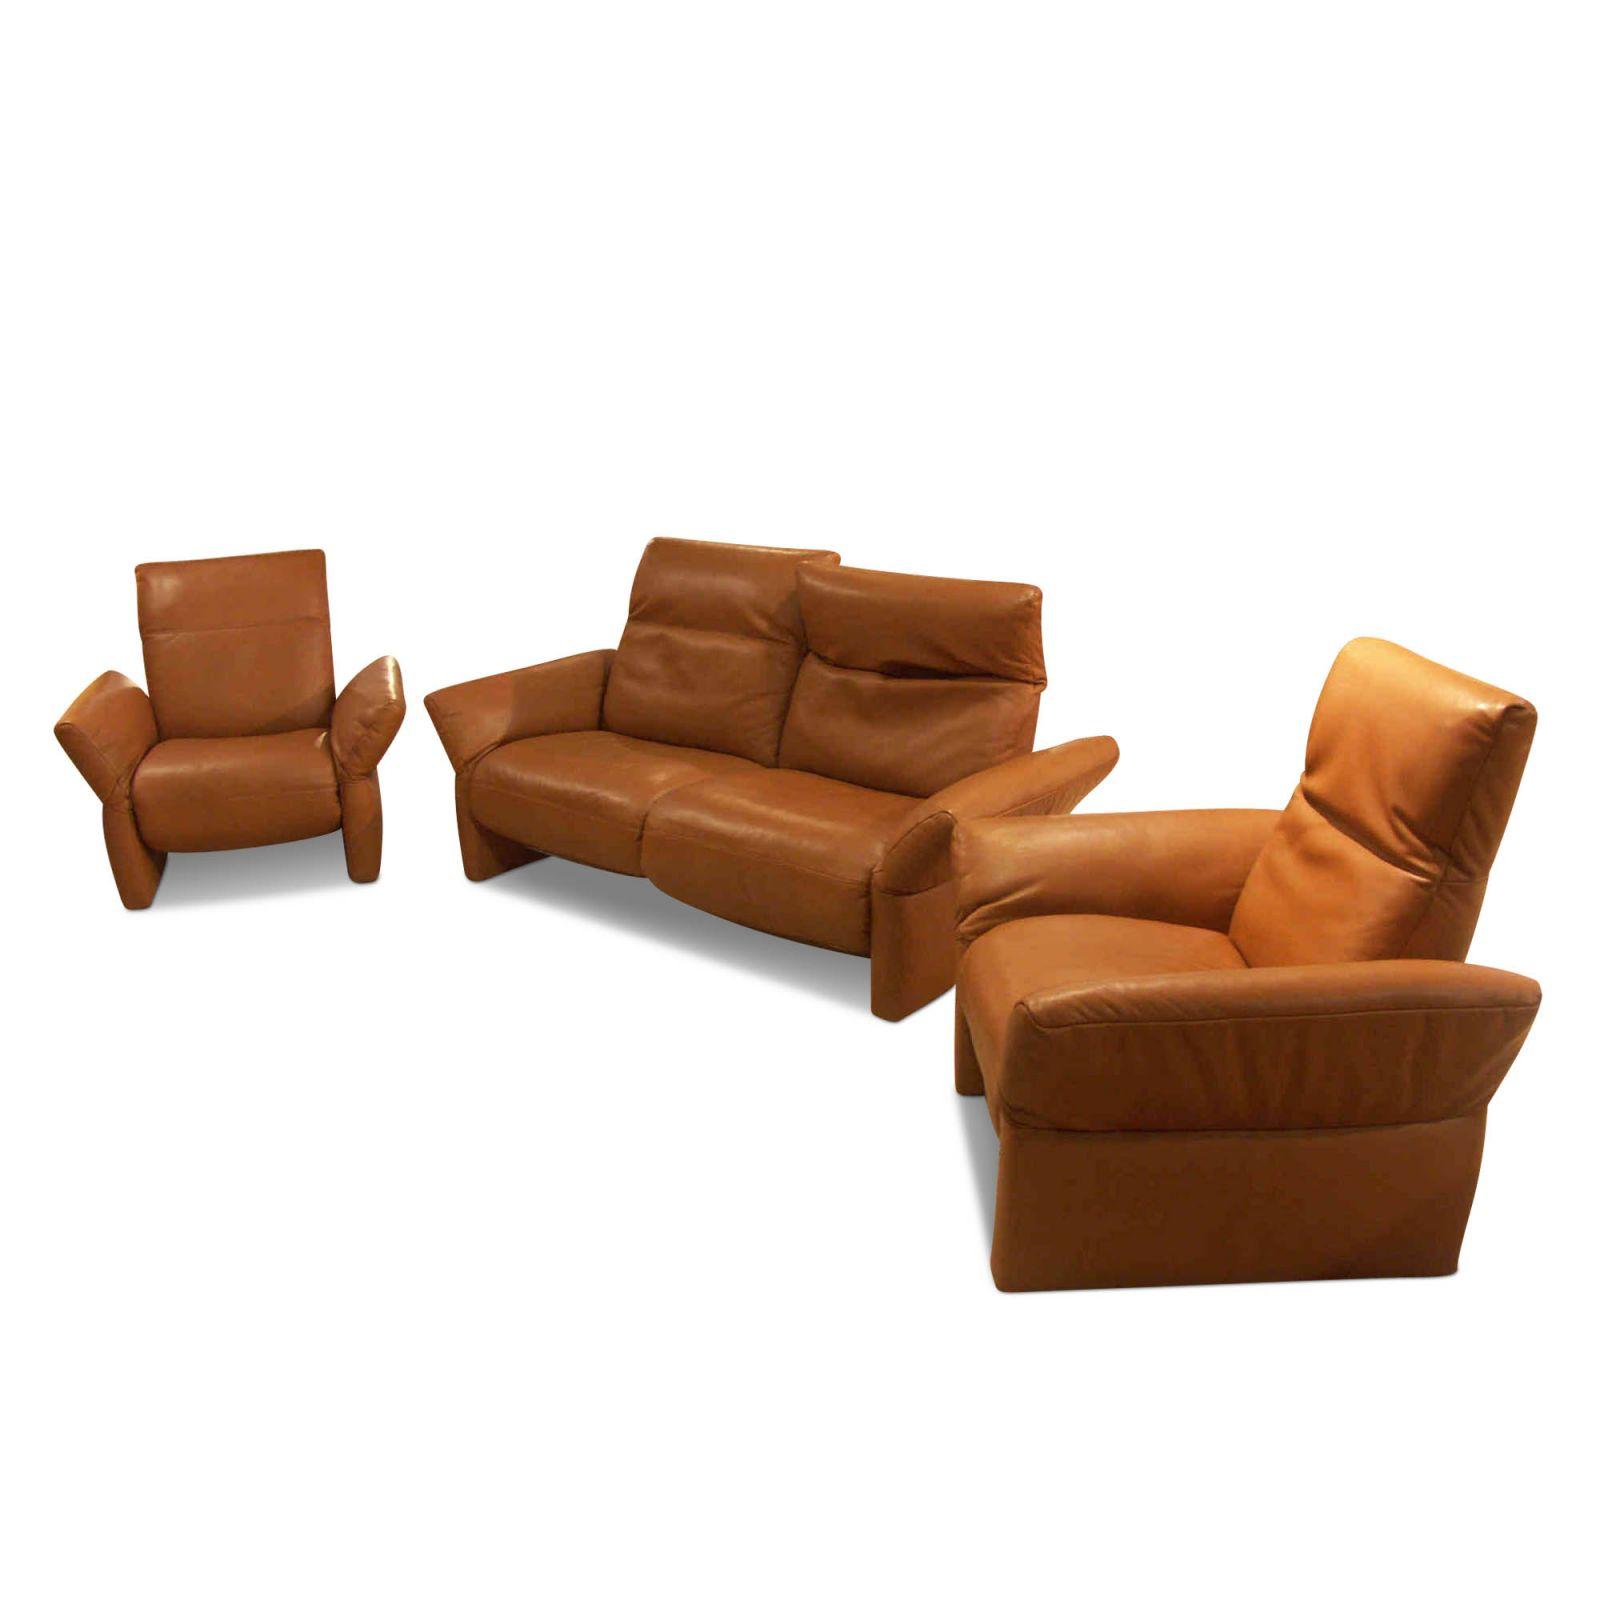 Garnitur Enzo 2 5 Sitzer Sofa 2 Sessel – Koinor – Sofas – günstig